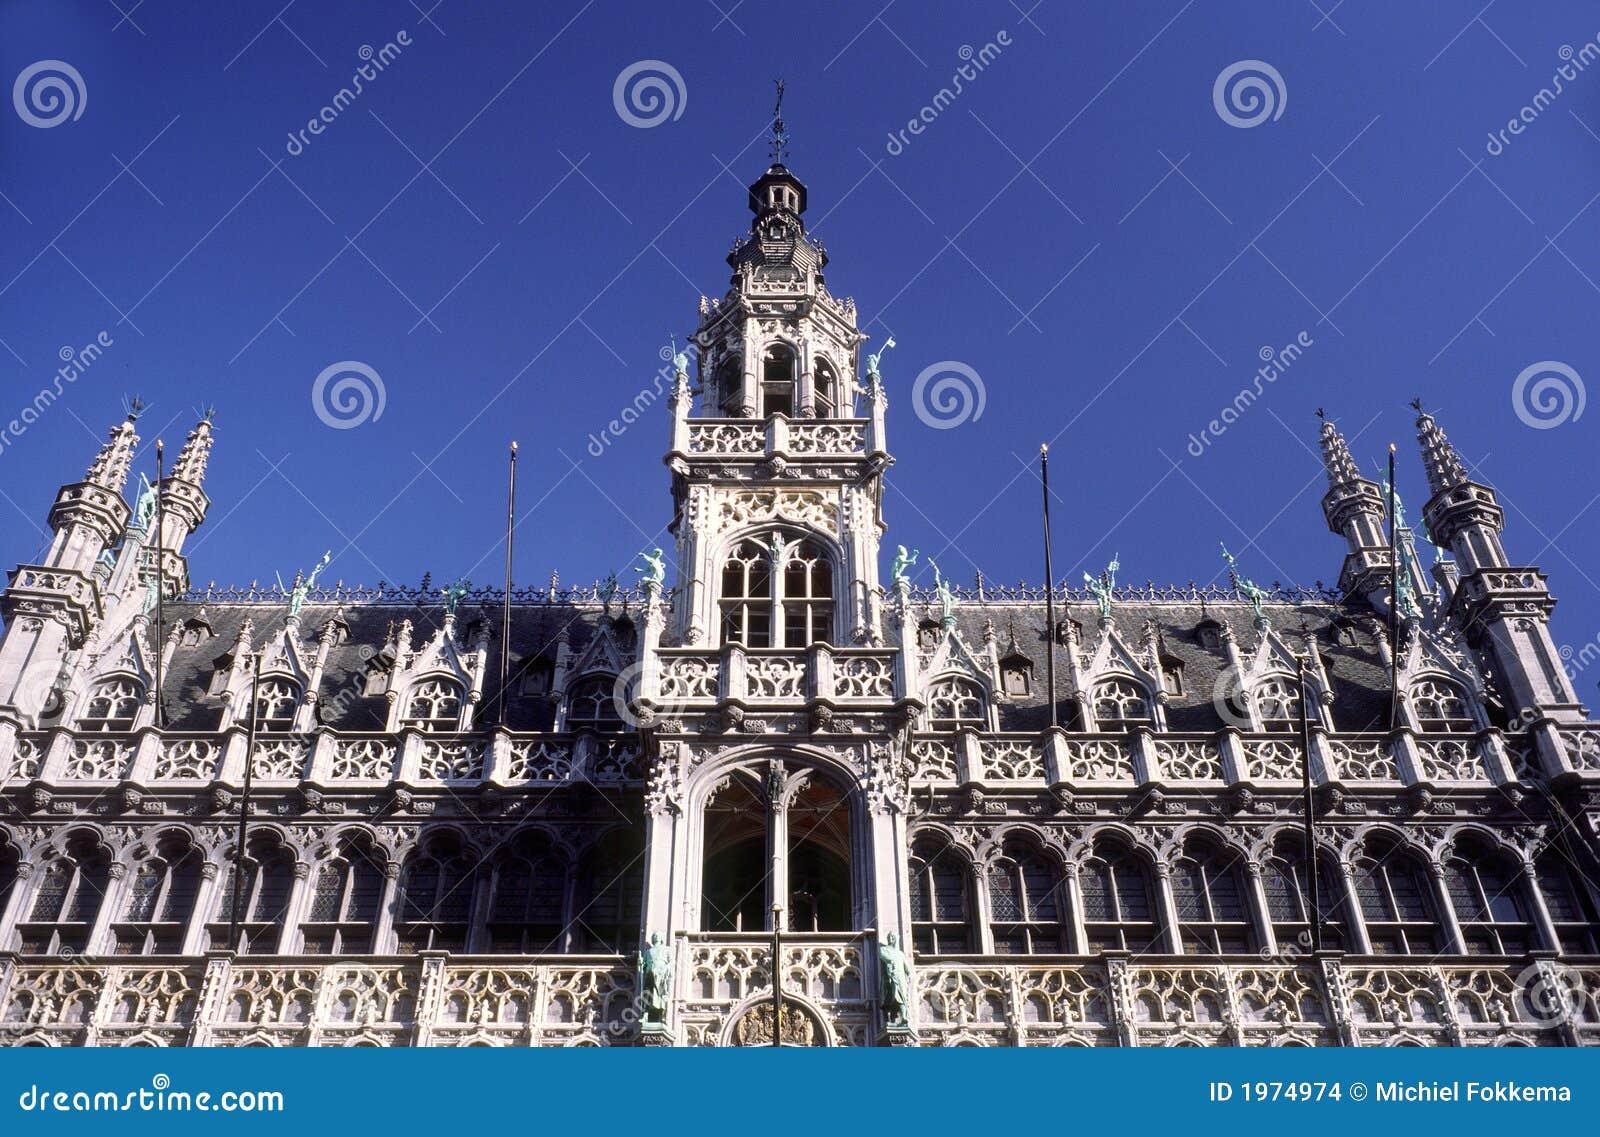 Brussel grote markt